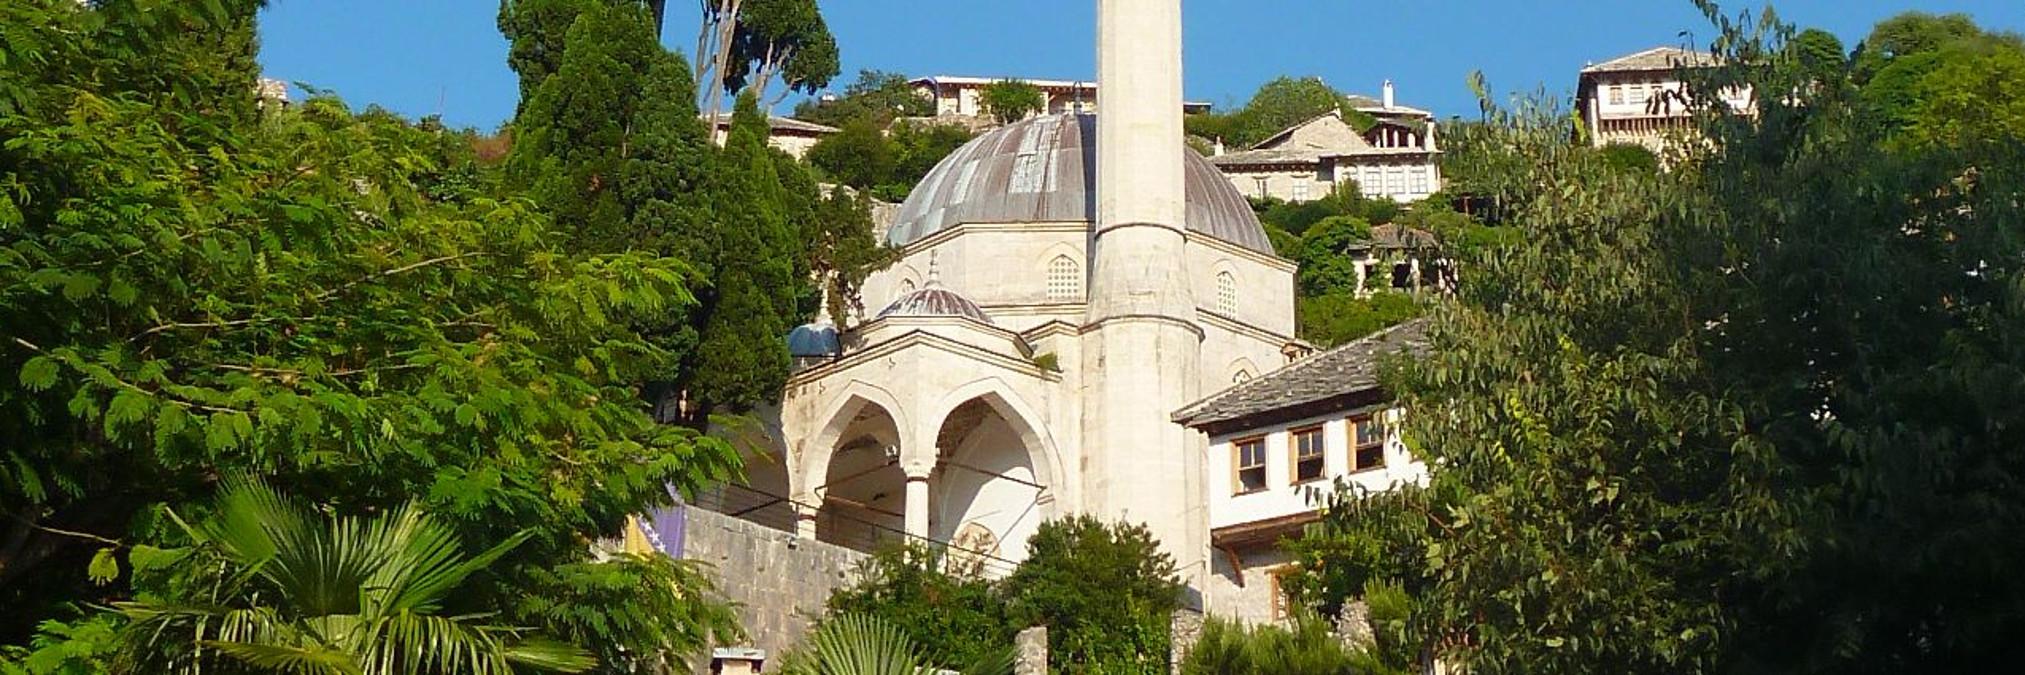 Мечеть Шишмана Ибрахима-паши